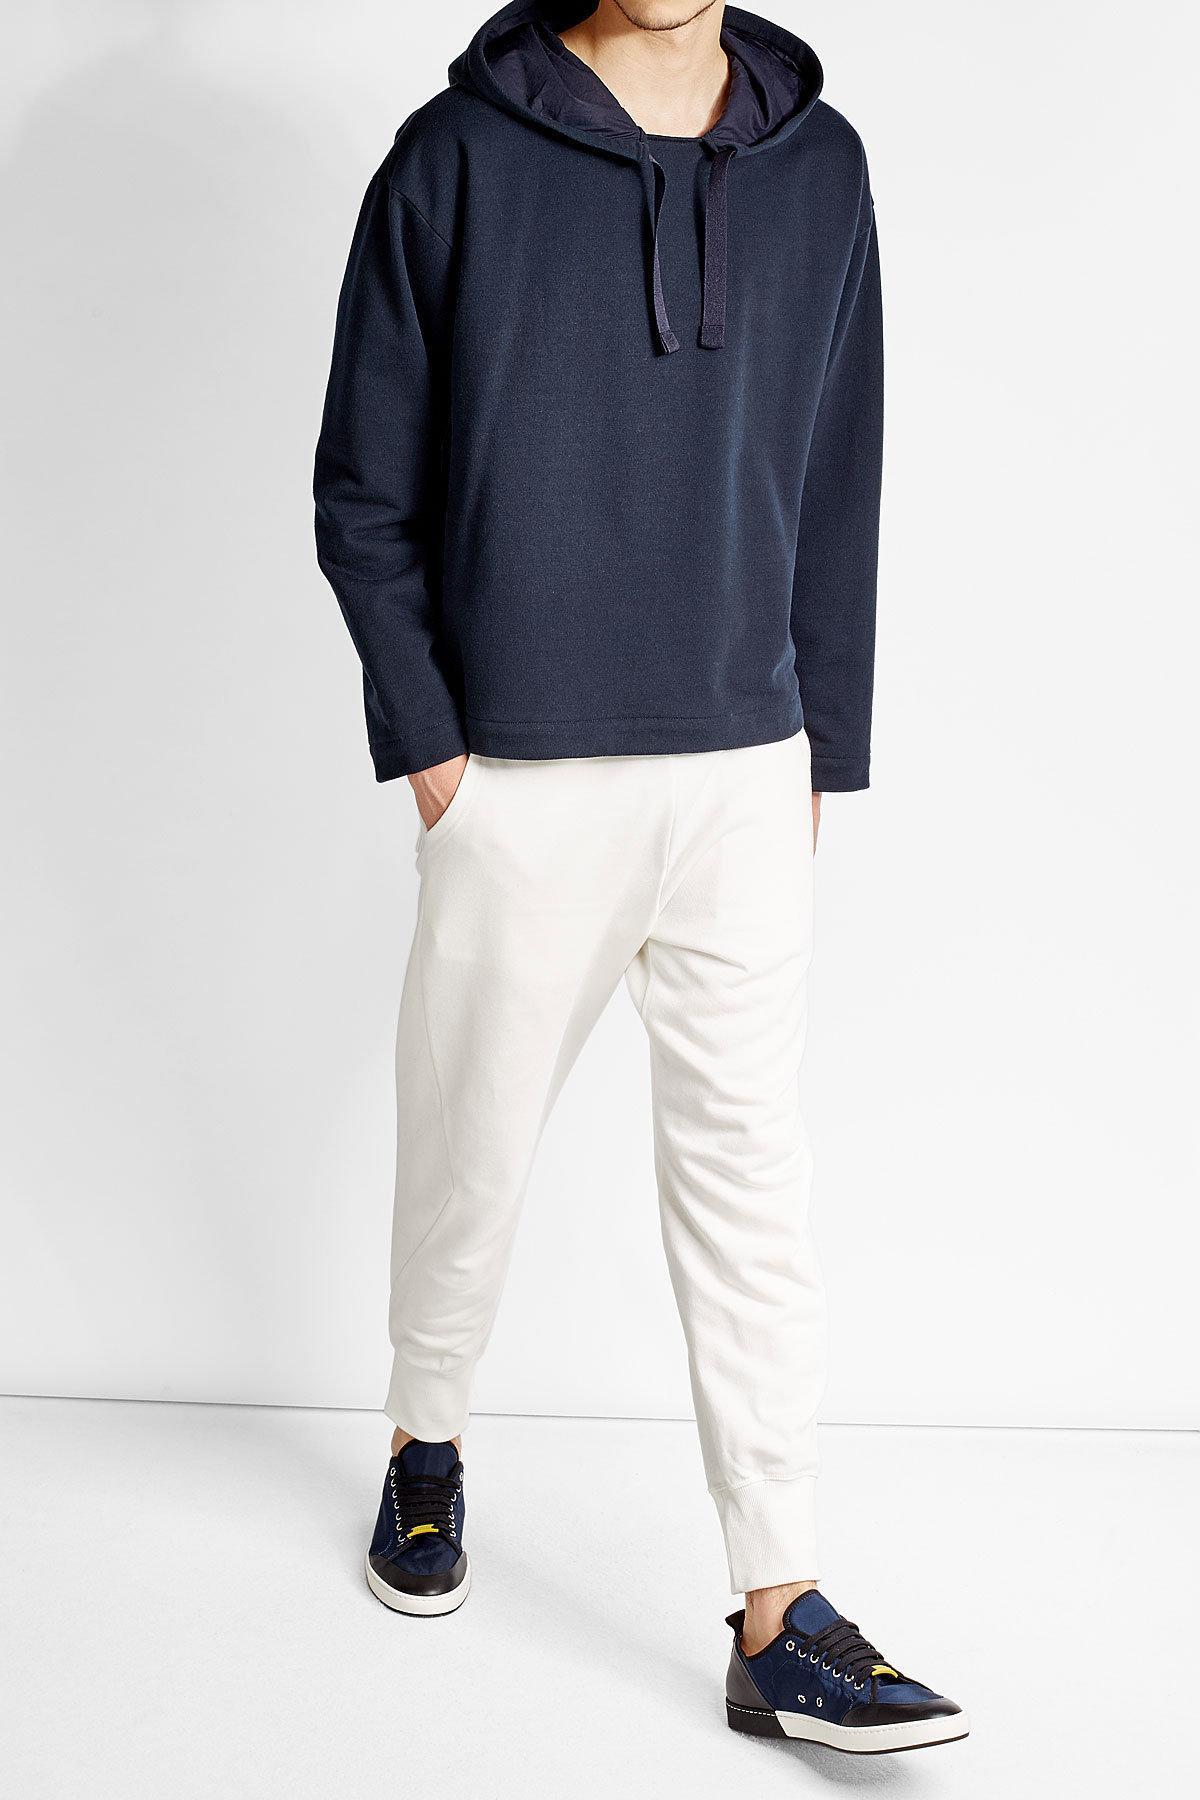 Lyst - Adidas Originals Xbyo Cotton Track Pants for Men